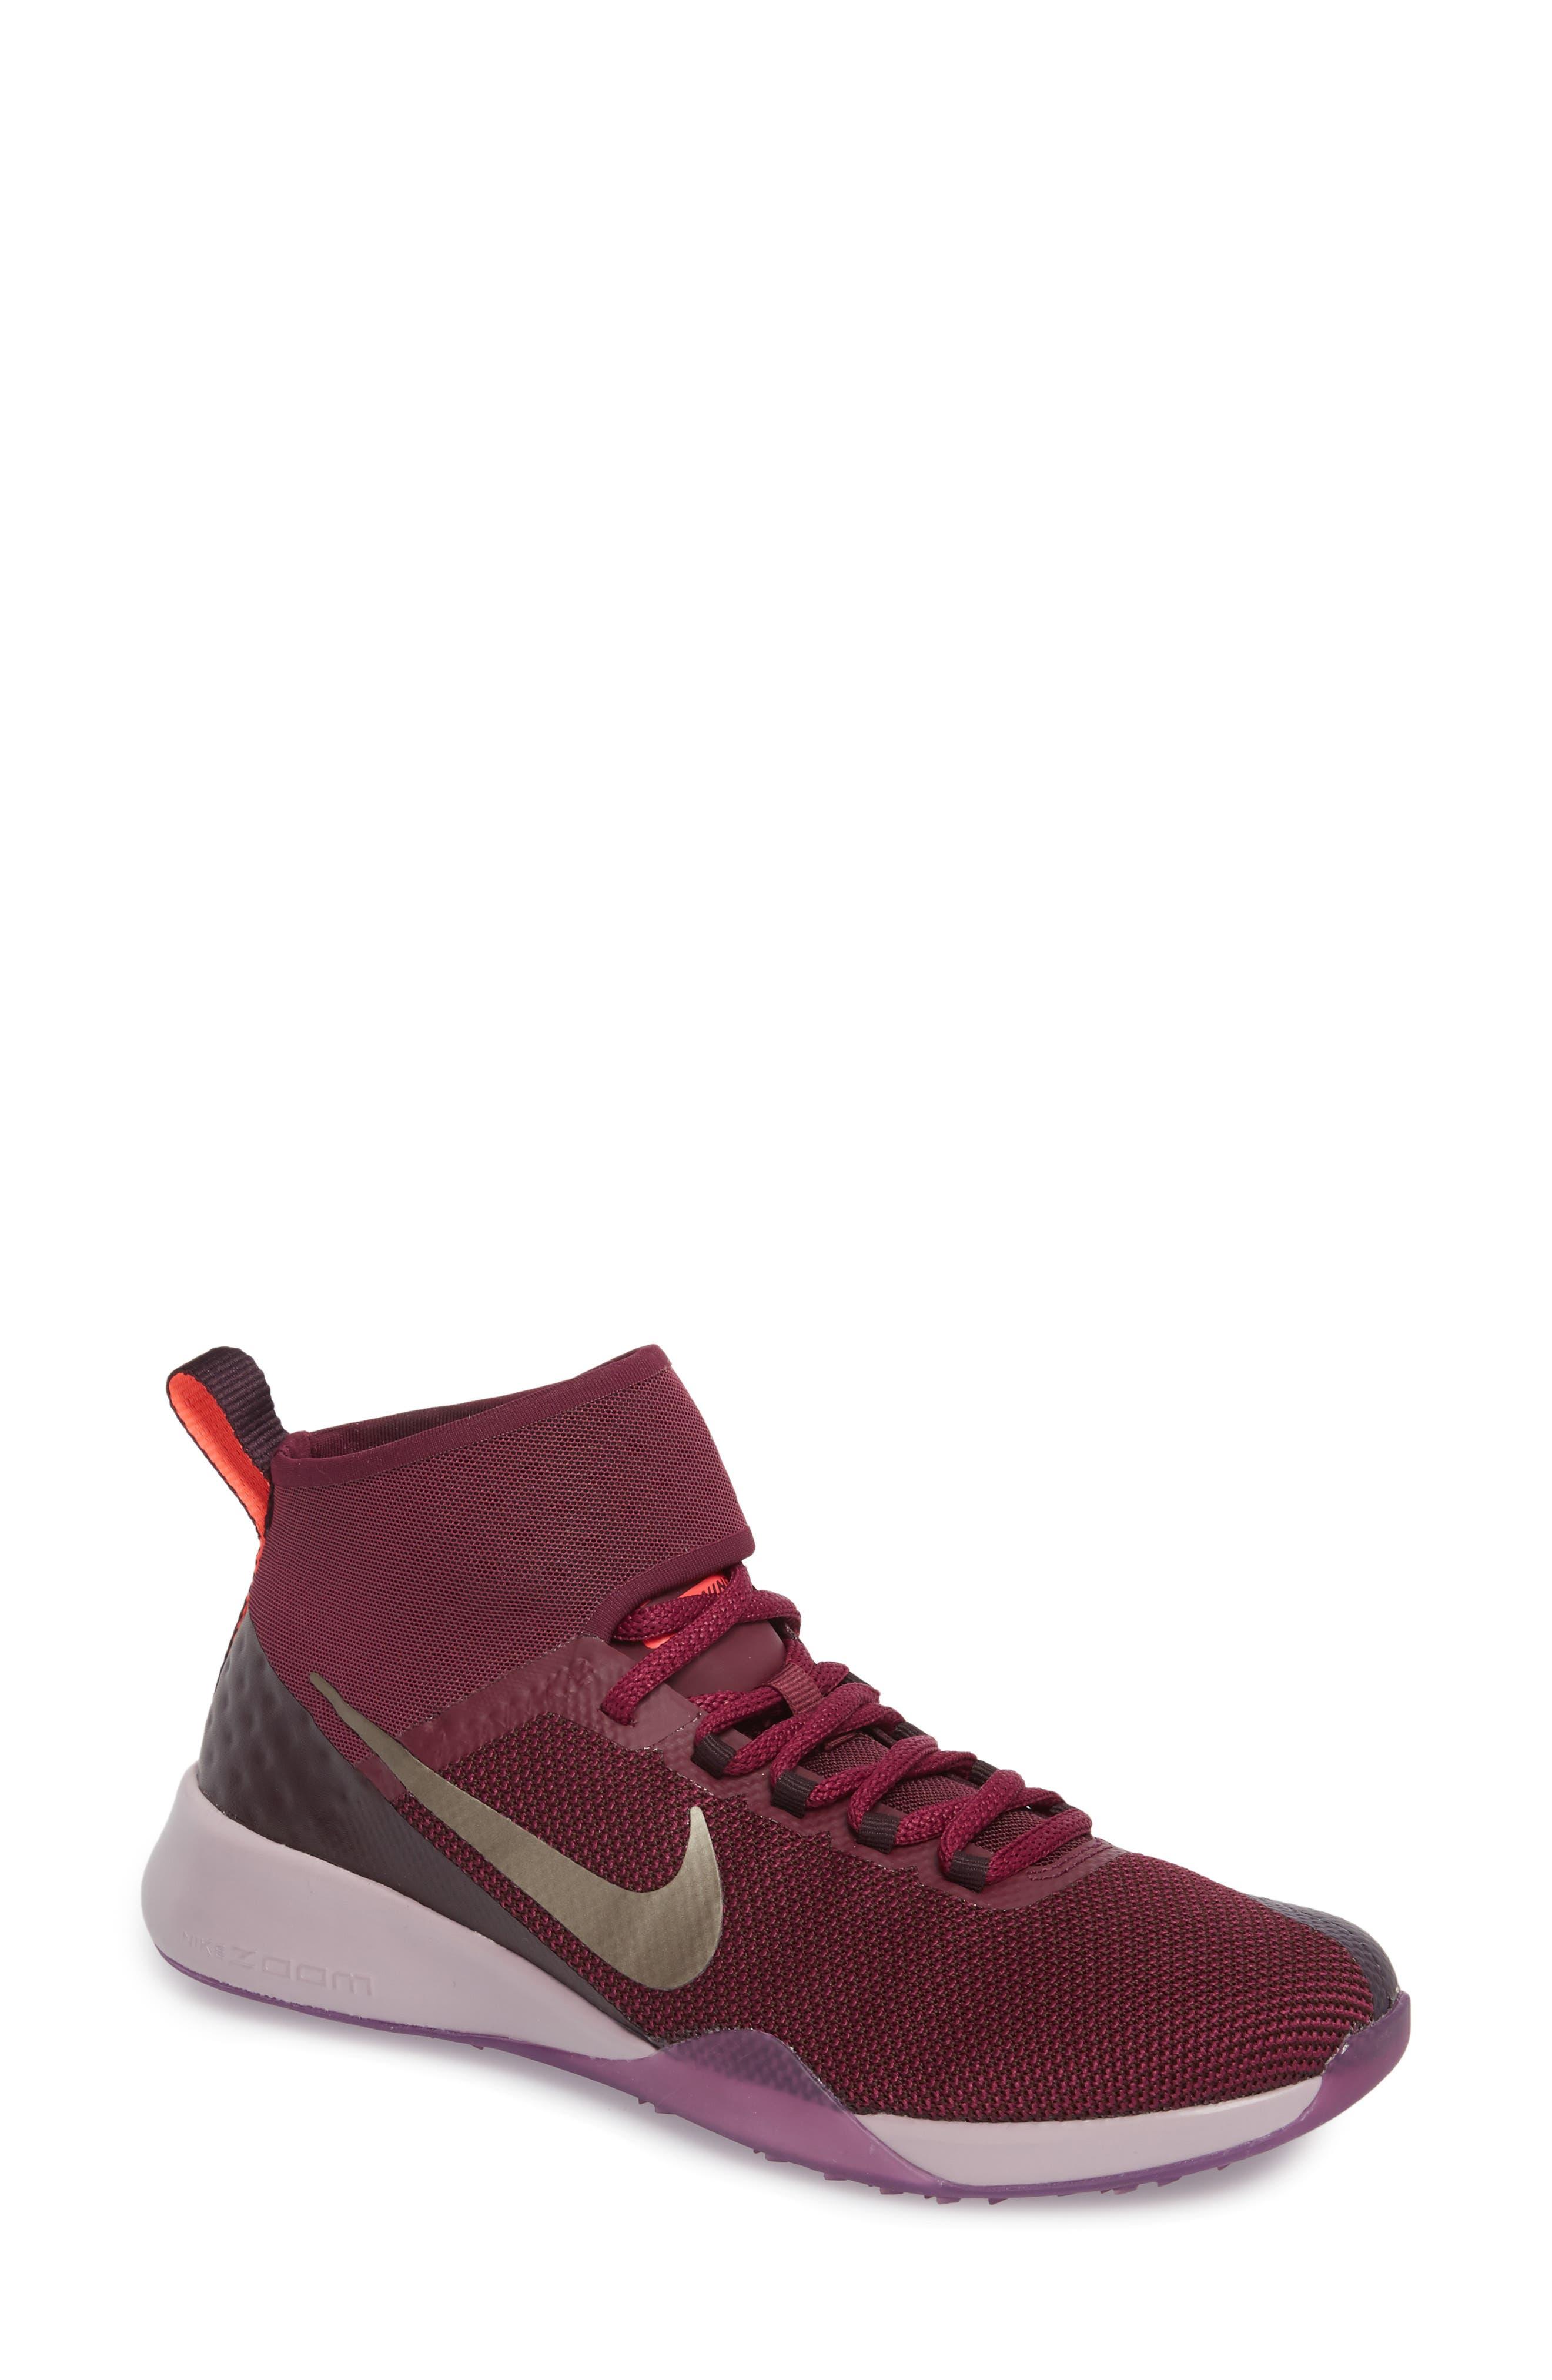 Air Zoom Strong 2 Gem Training Shoe,                         Main,                         color, Bordeaux/ Metallic Pewter